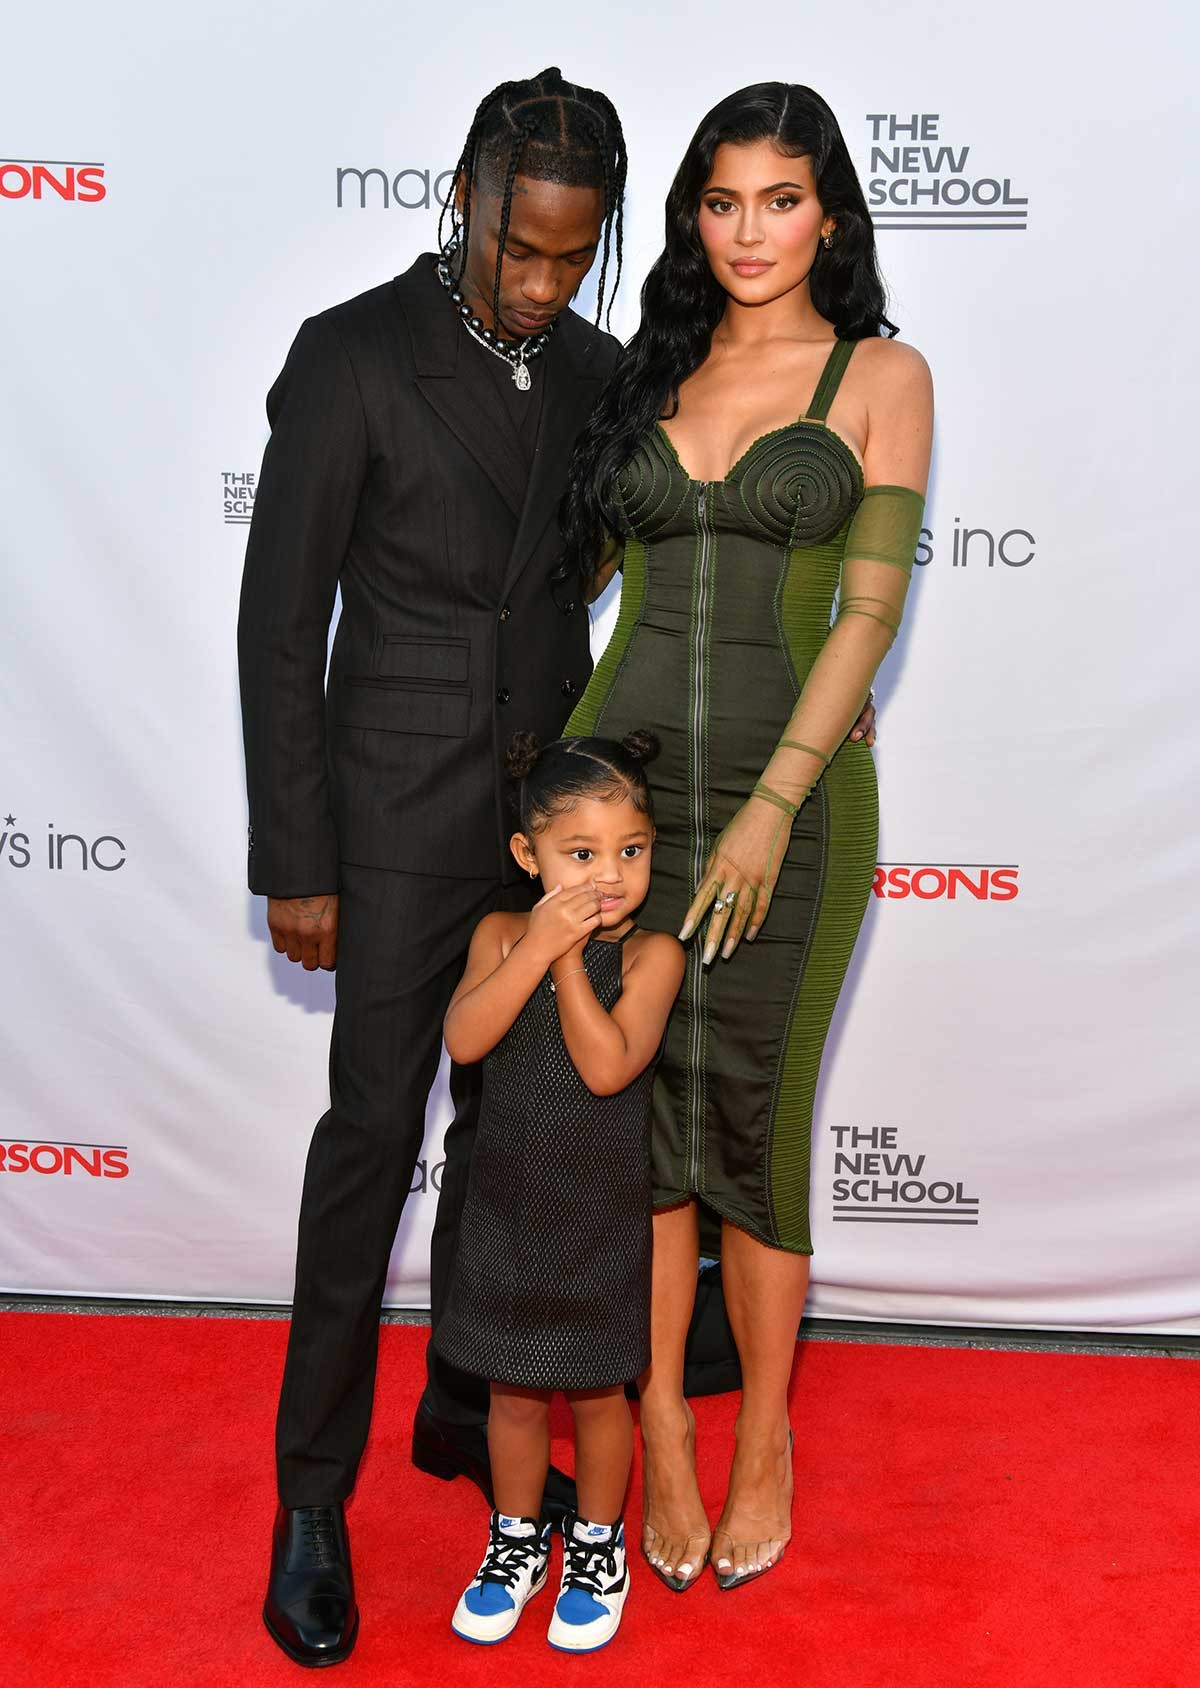 Travis Scott, Kylie Jenner and daughter Stormi